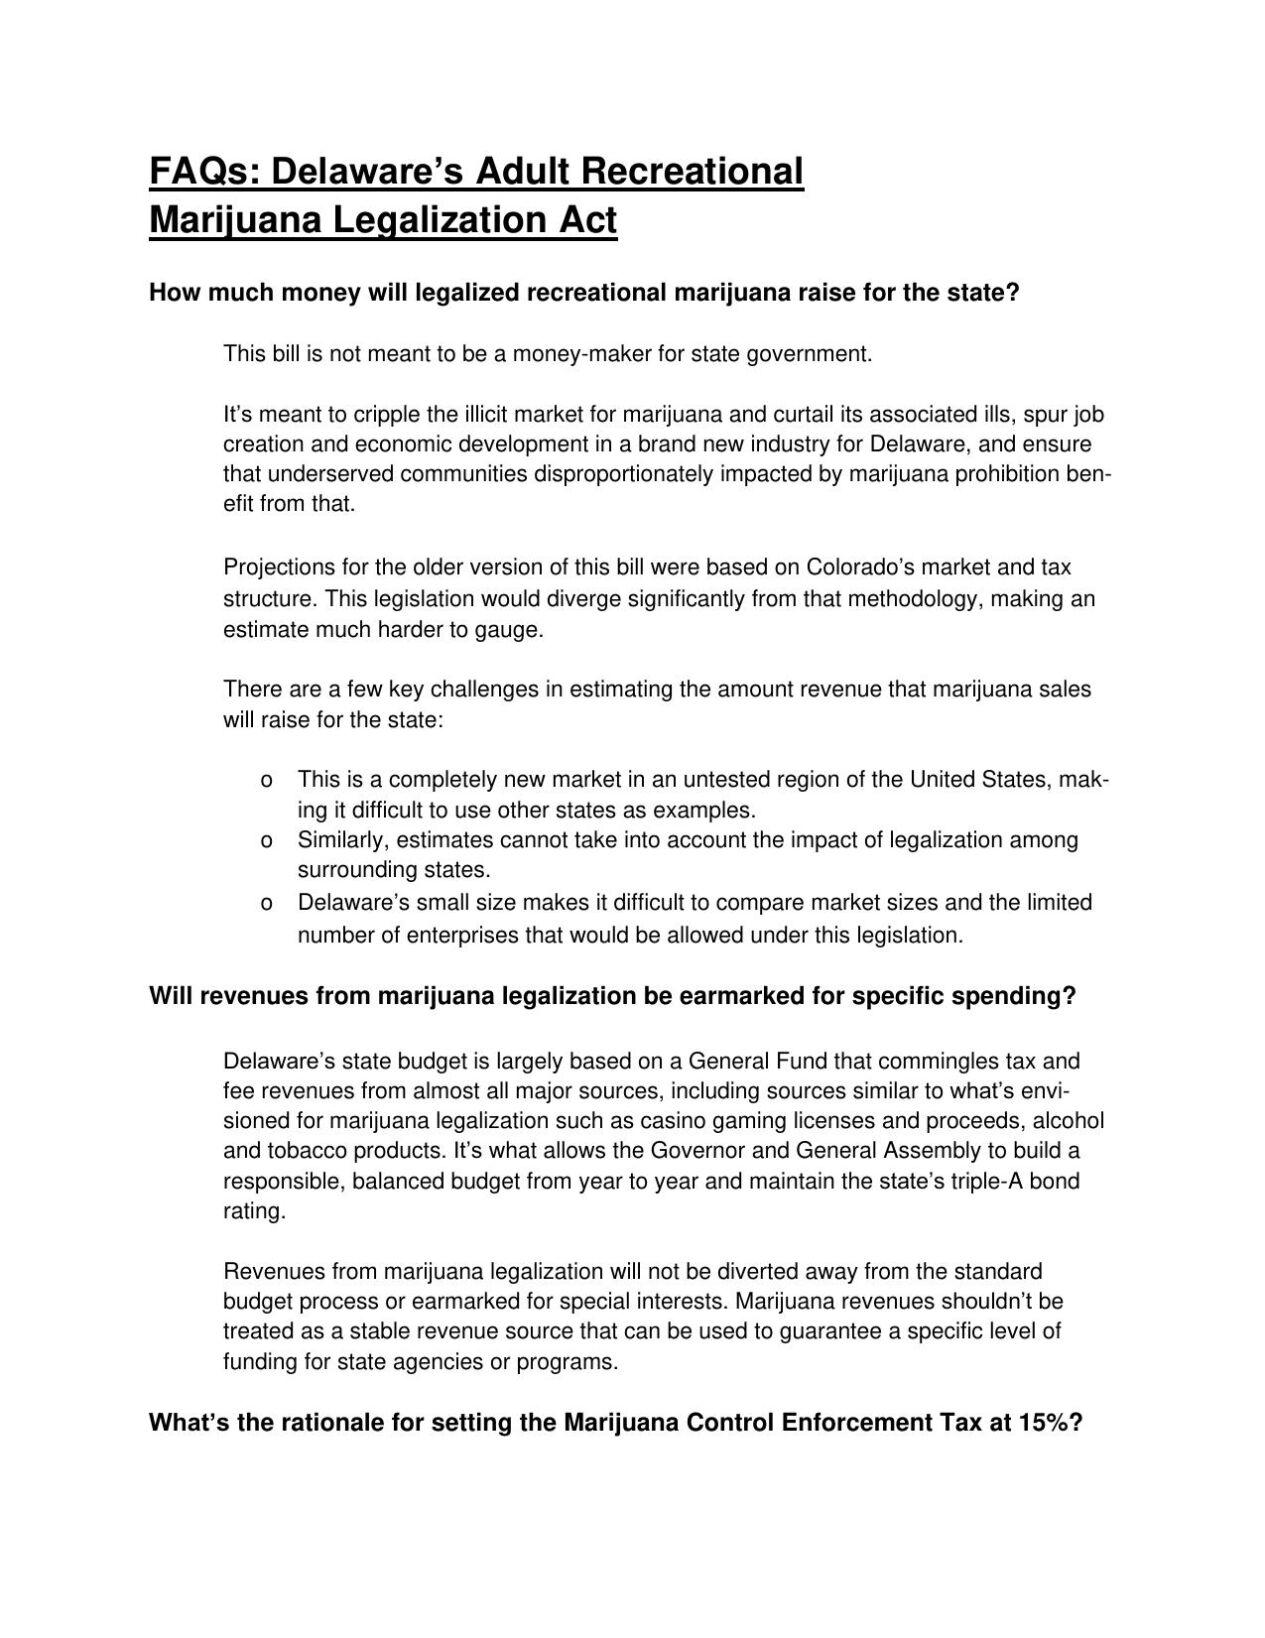 HB150 Marijuana FAQs